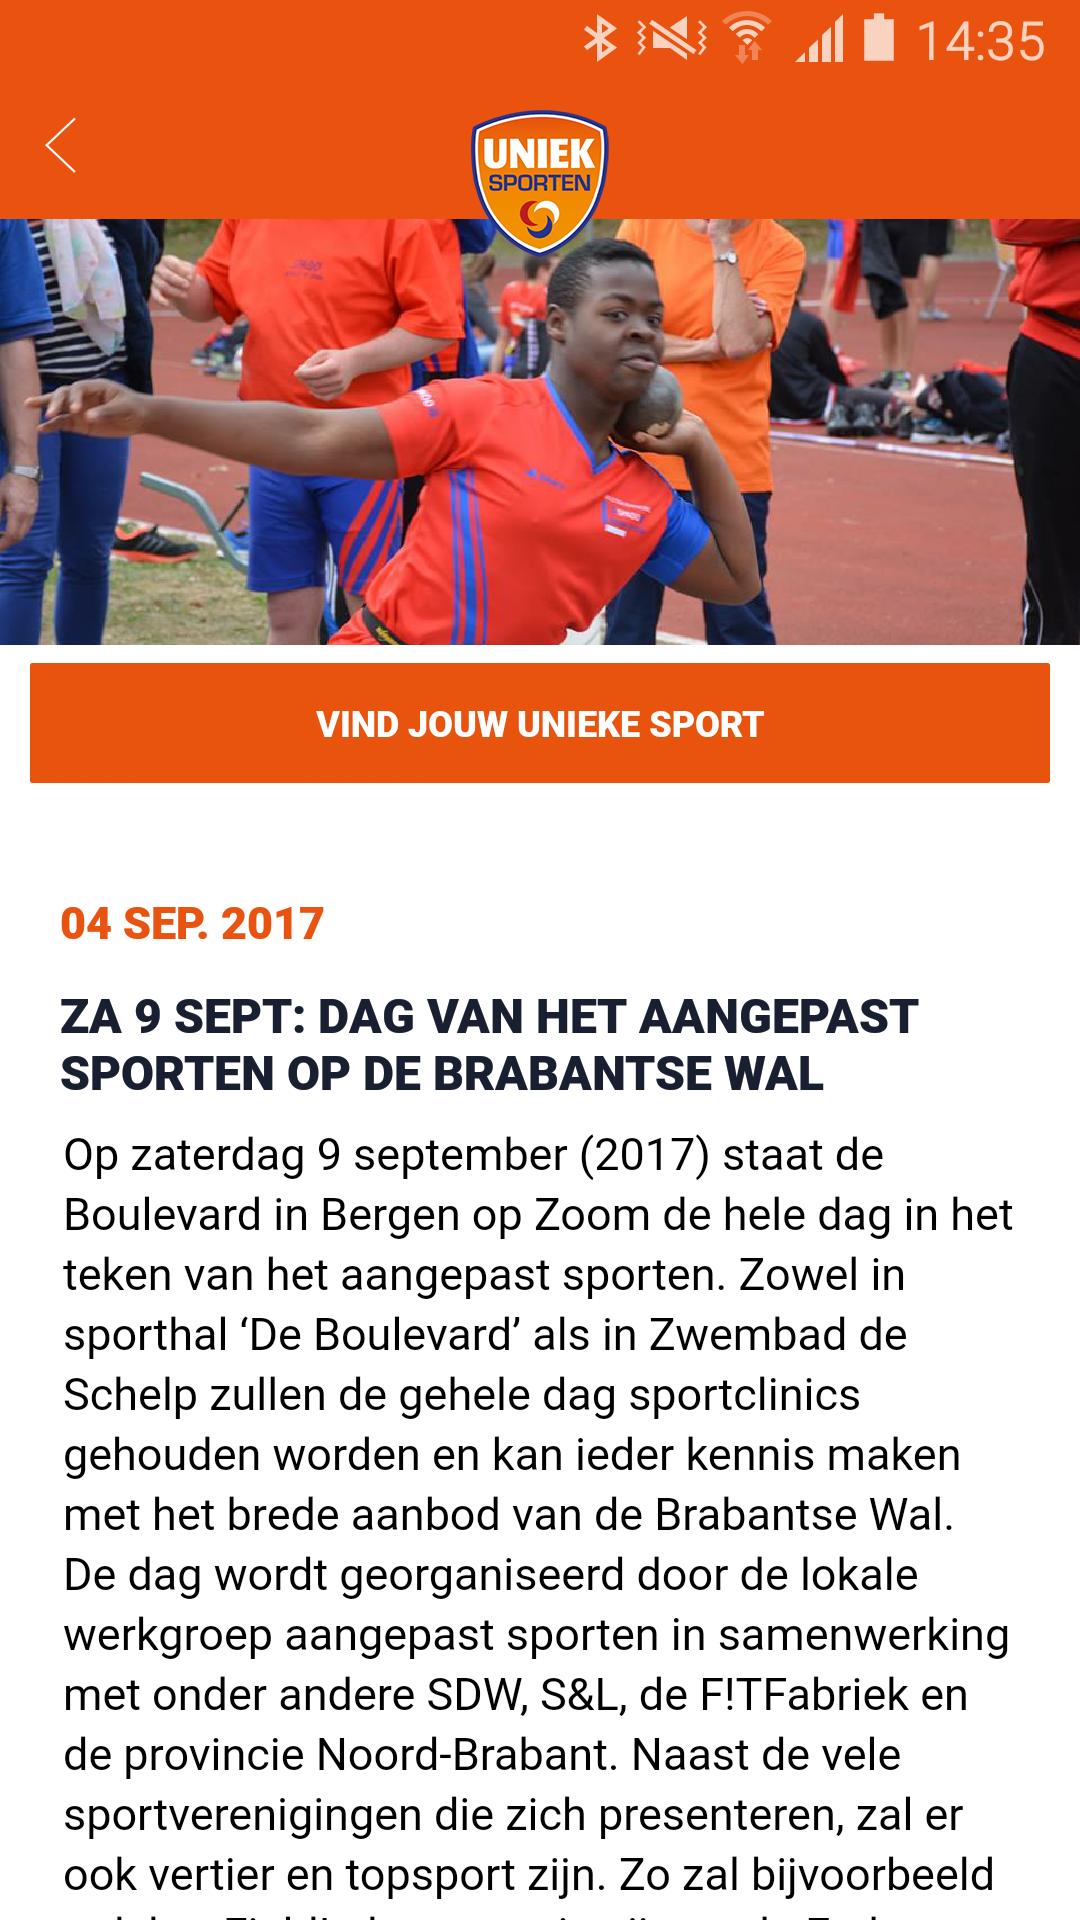 Uniek Sporten Android App screenshot 2